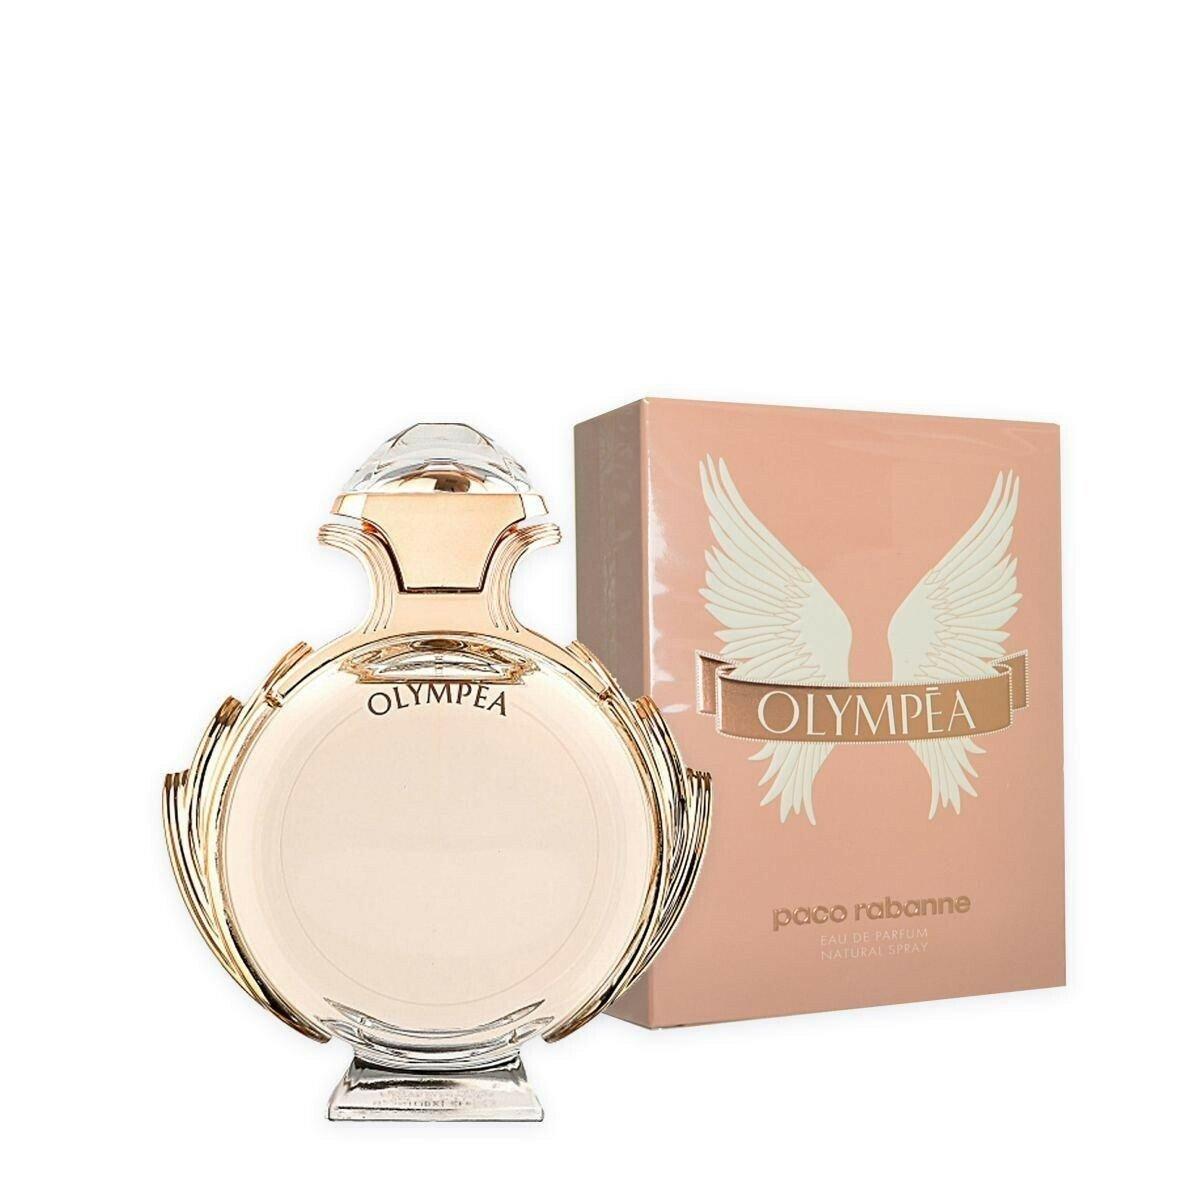 Paco Rabanne Olympea Eau de Parfum for Women - 50ml